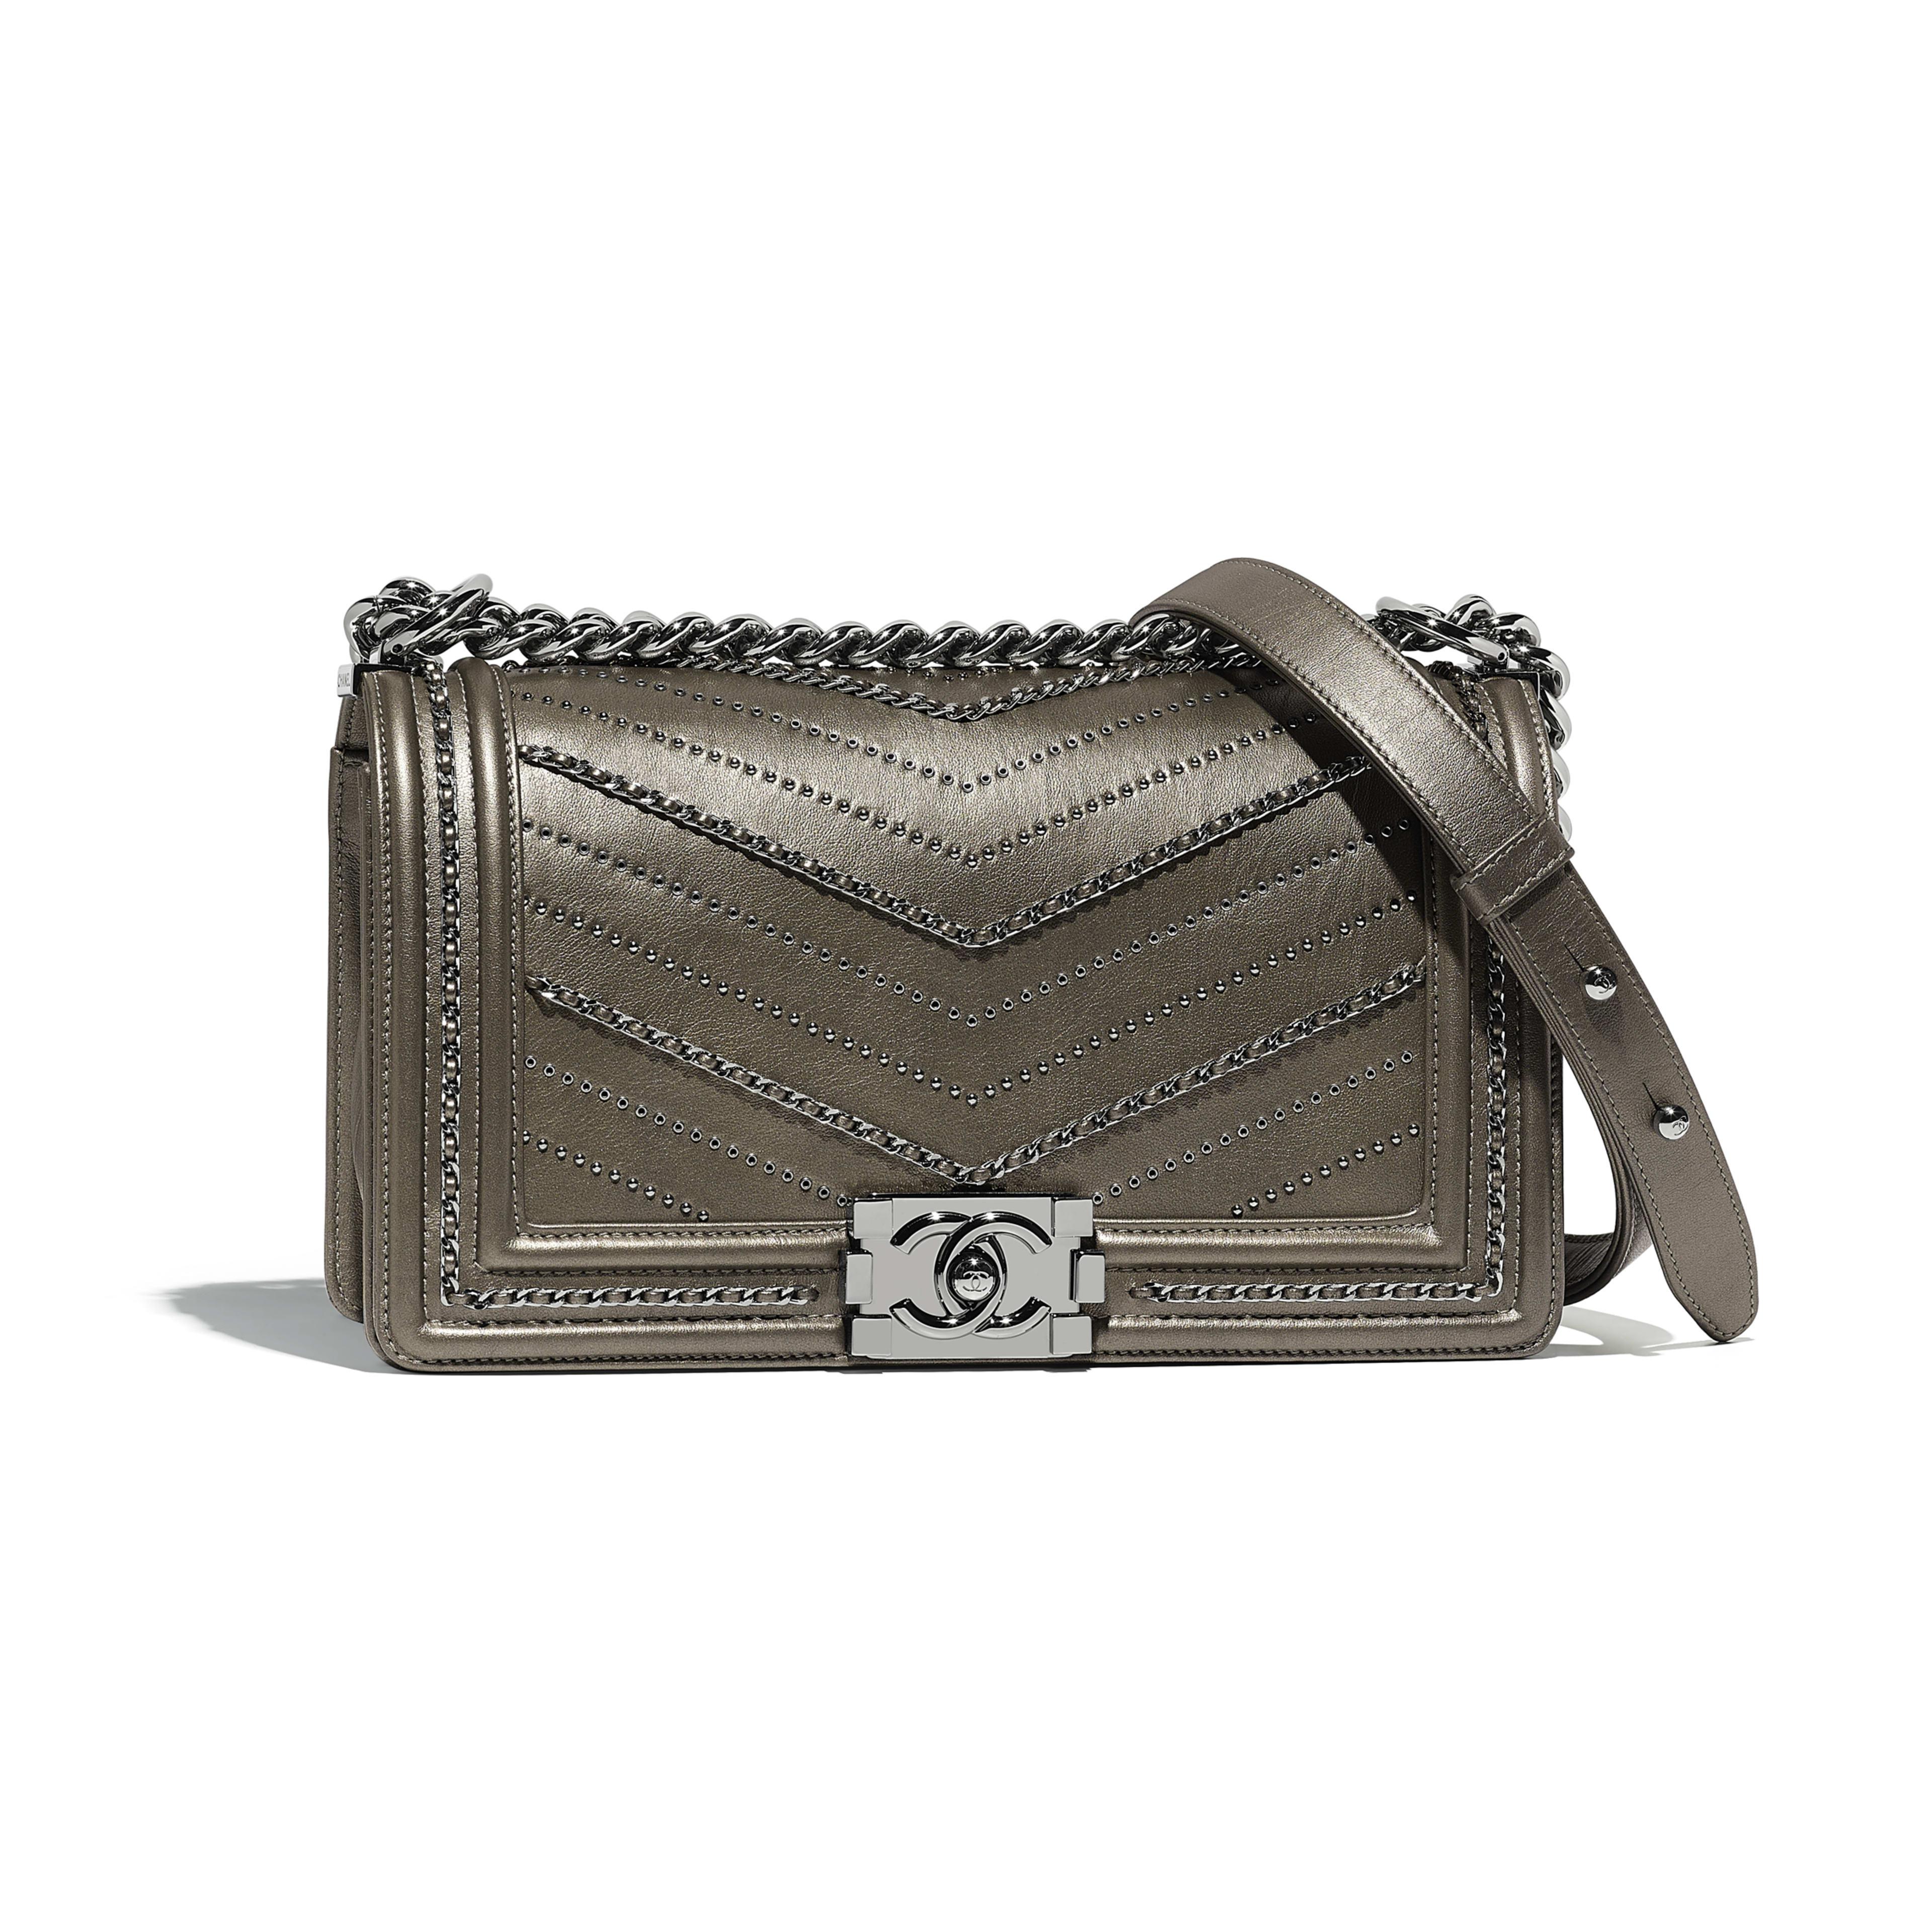 BOY CHANEL Handbag Metallic Crumpled Calfskin & Ruthenium-Finish Metal Silver -                                  view 1 - see full sized version